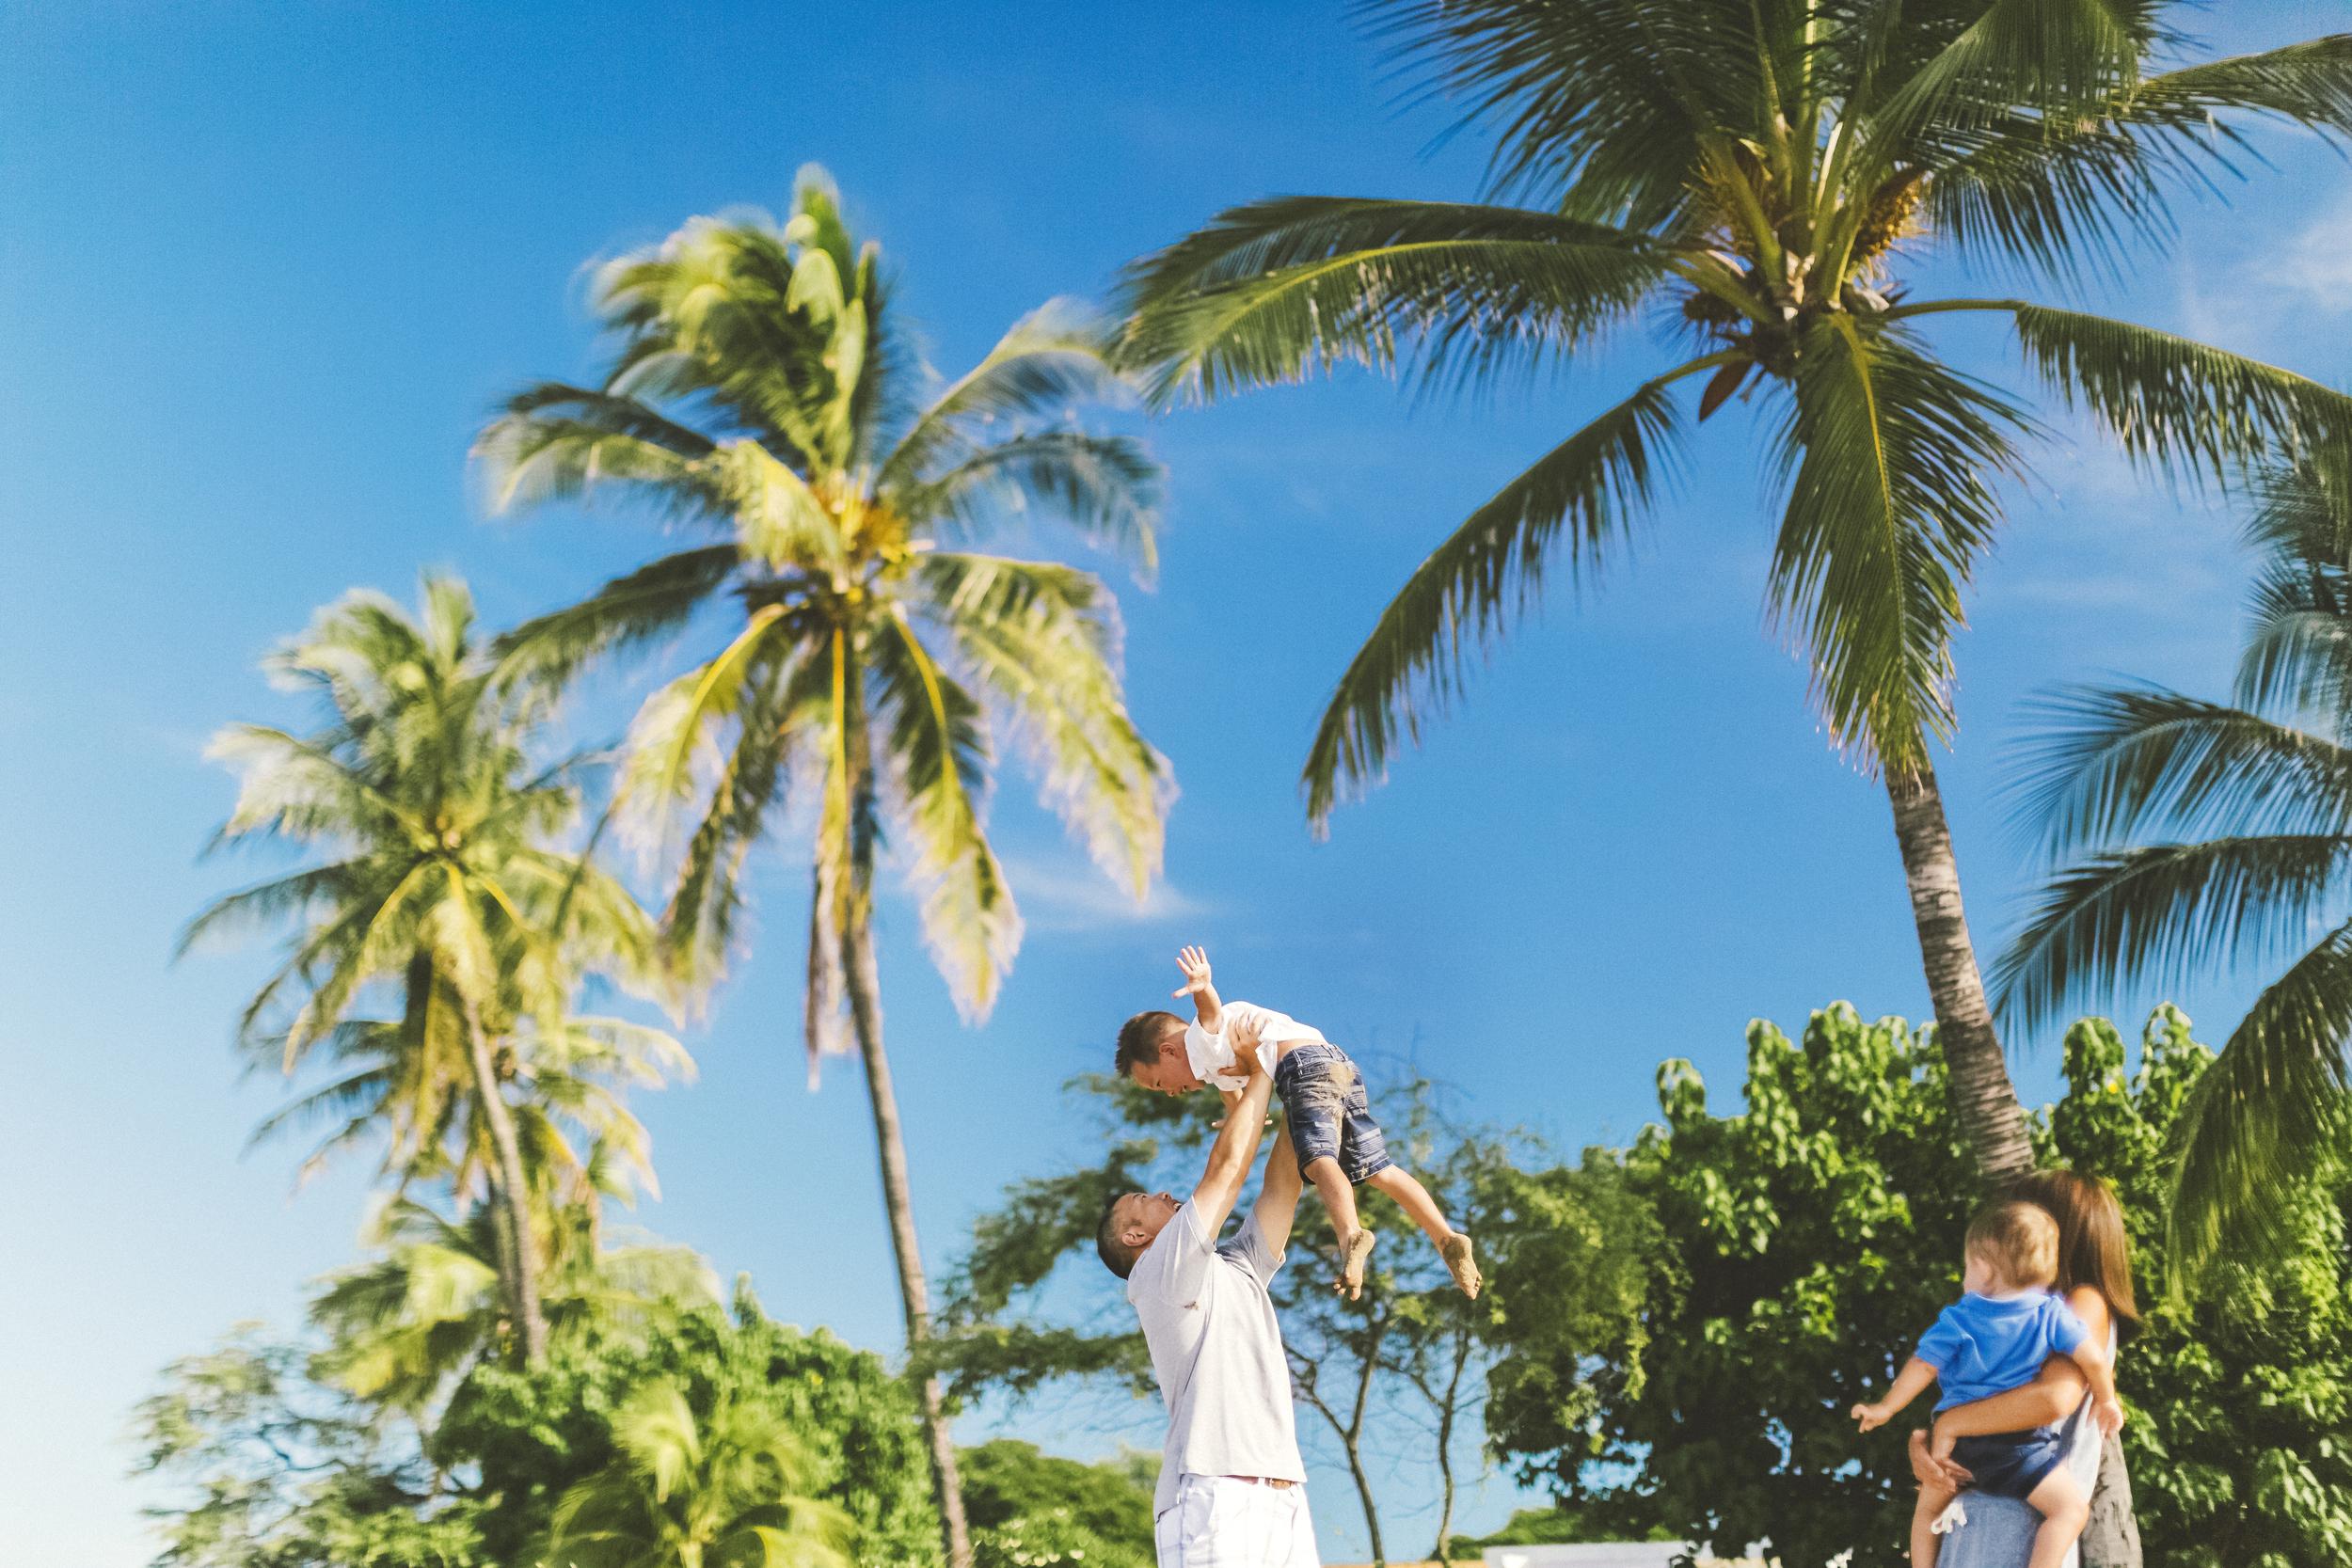 AngieDiaz|beachfamilysession081copy.jpg